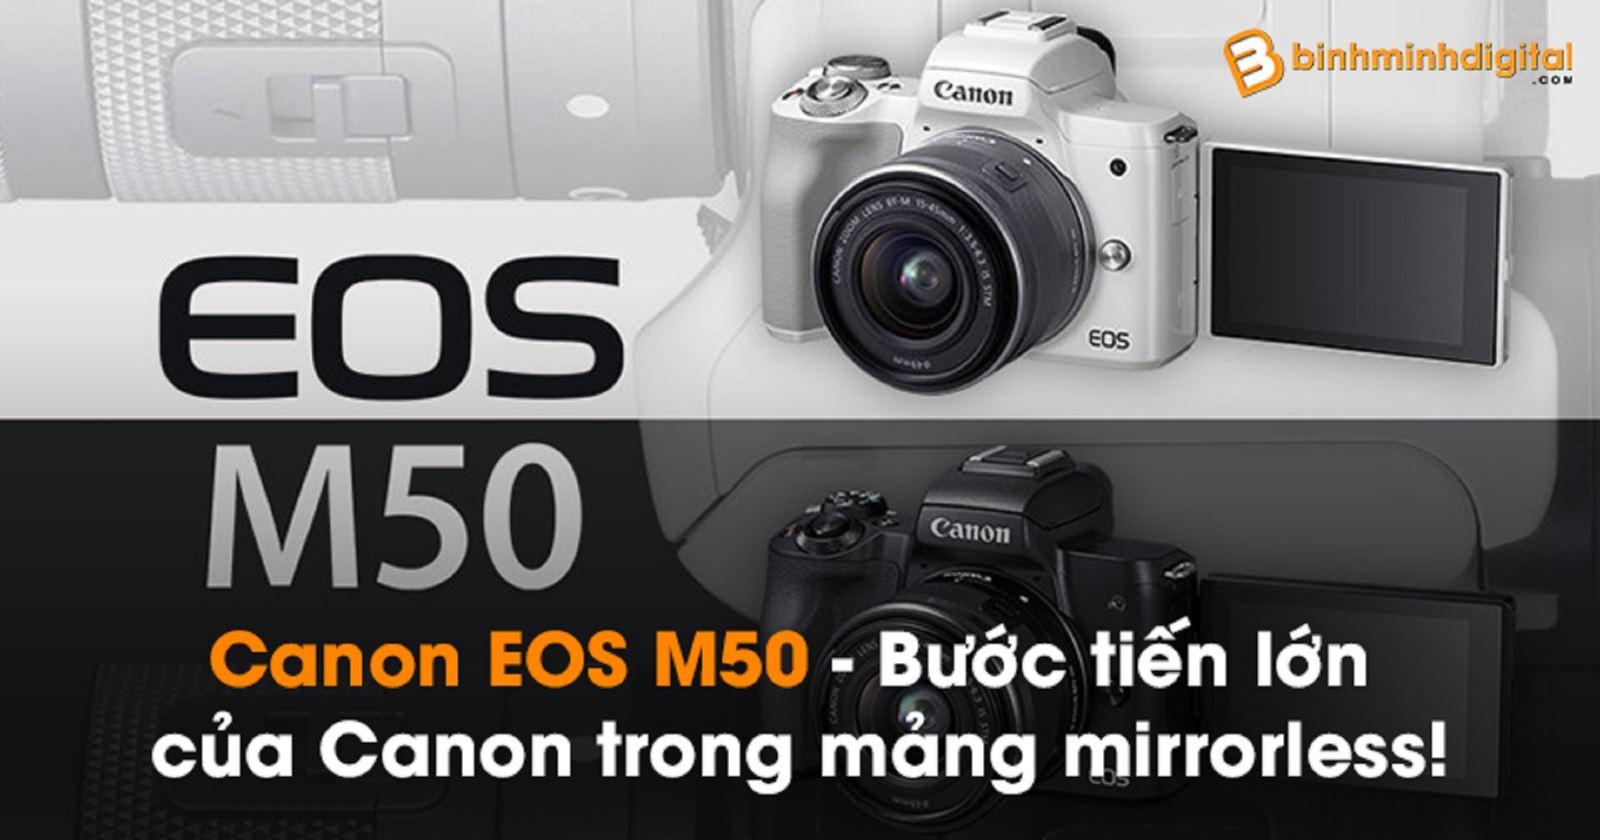 Canon EOS M50 - Bước tiến lớn của Canon trong mảng mirrorless!